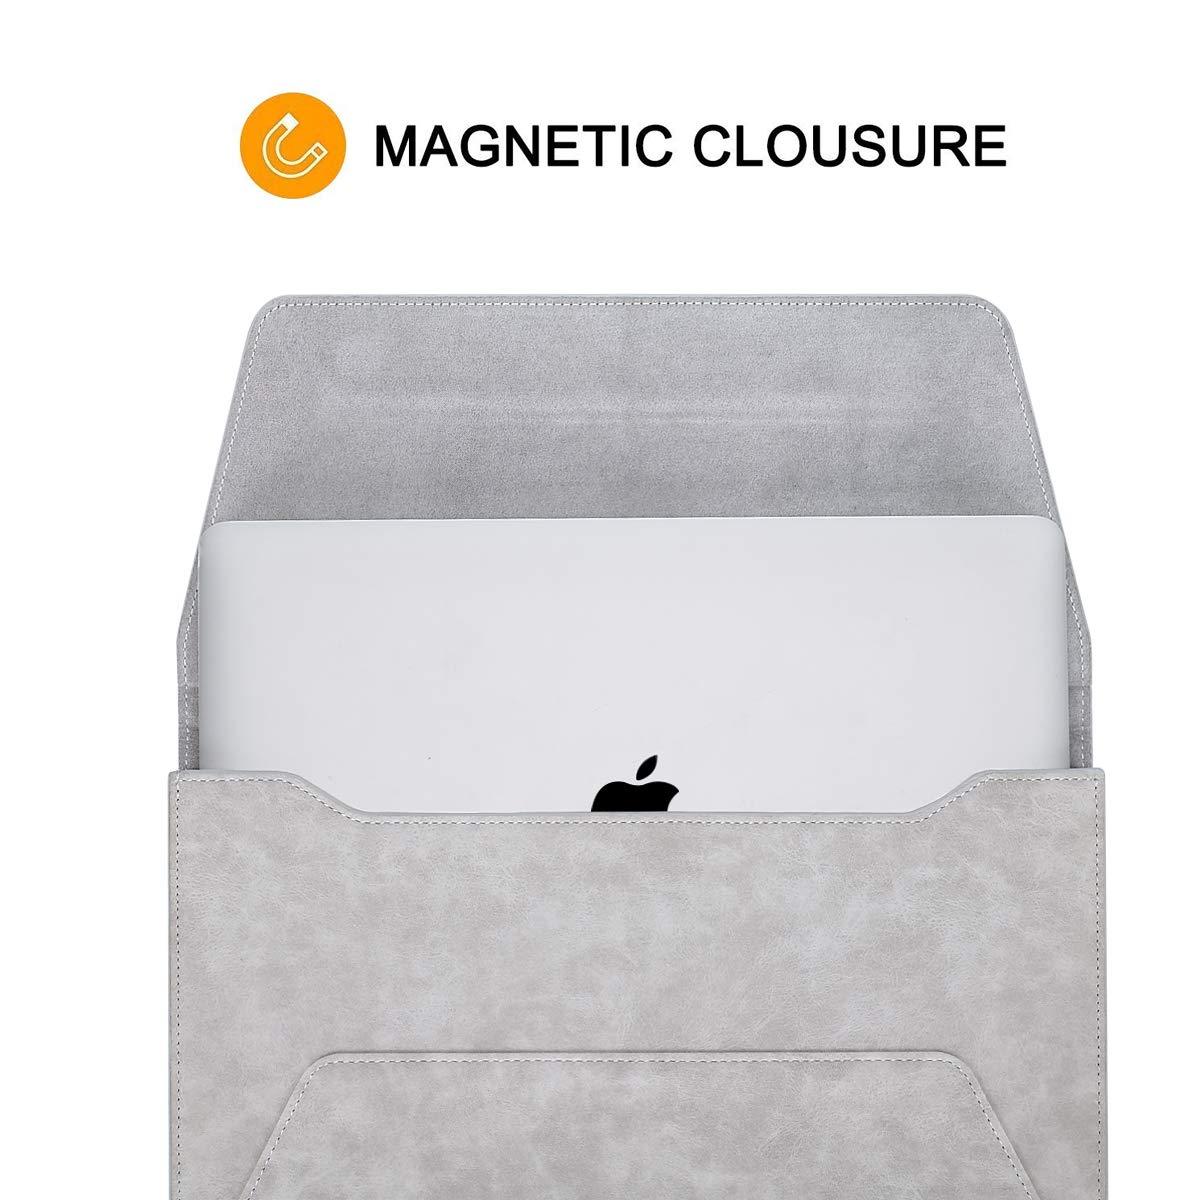 Bolsa de Estilo Solapa con Cierre Magn/ético Marr/ón MOSISO PU Funda Protectora Compatible con 2019 2018 MacBook Air 13 A1932//2019-2016 MacBook Pro 13 A2159 A1989 A1706 A1708//2018 Surface Pro 6